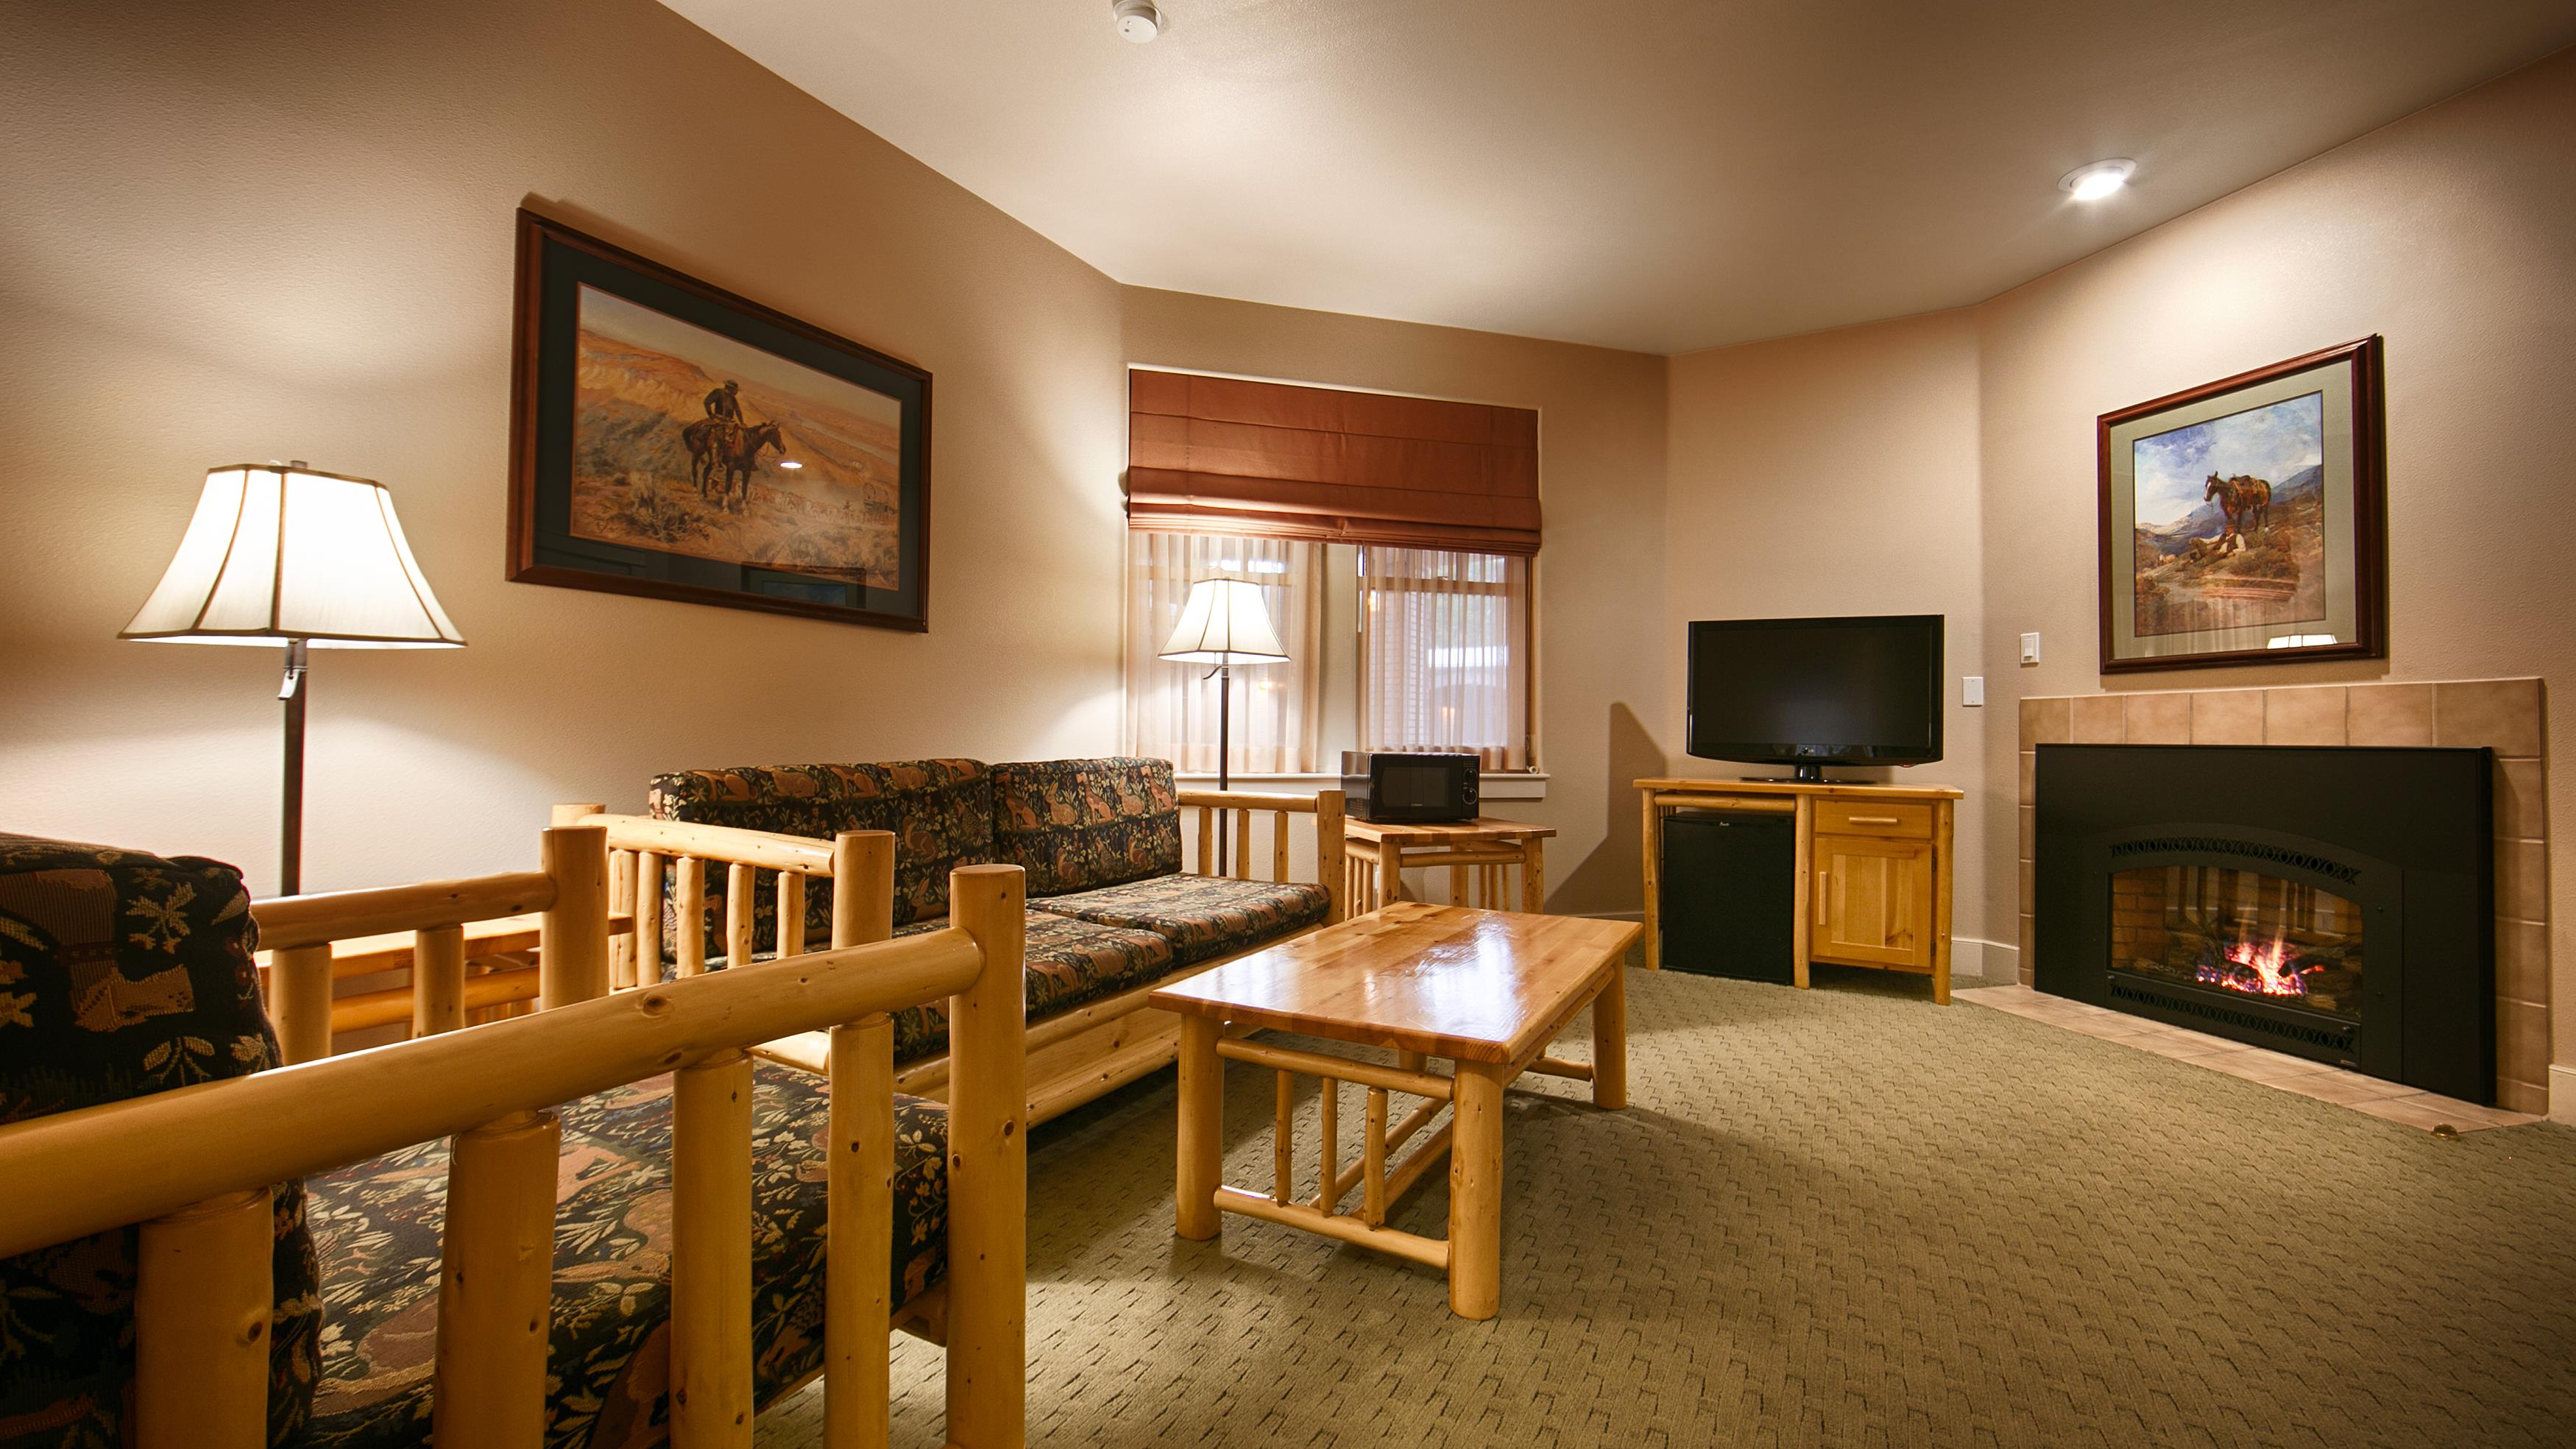 Best Western Plus Plaza Hotel image 23